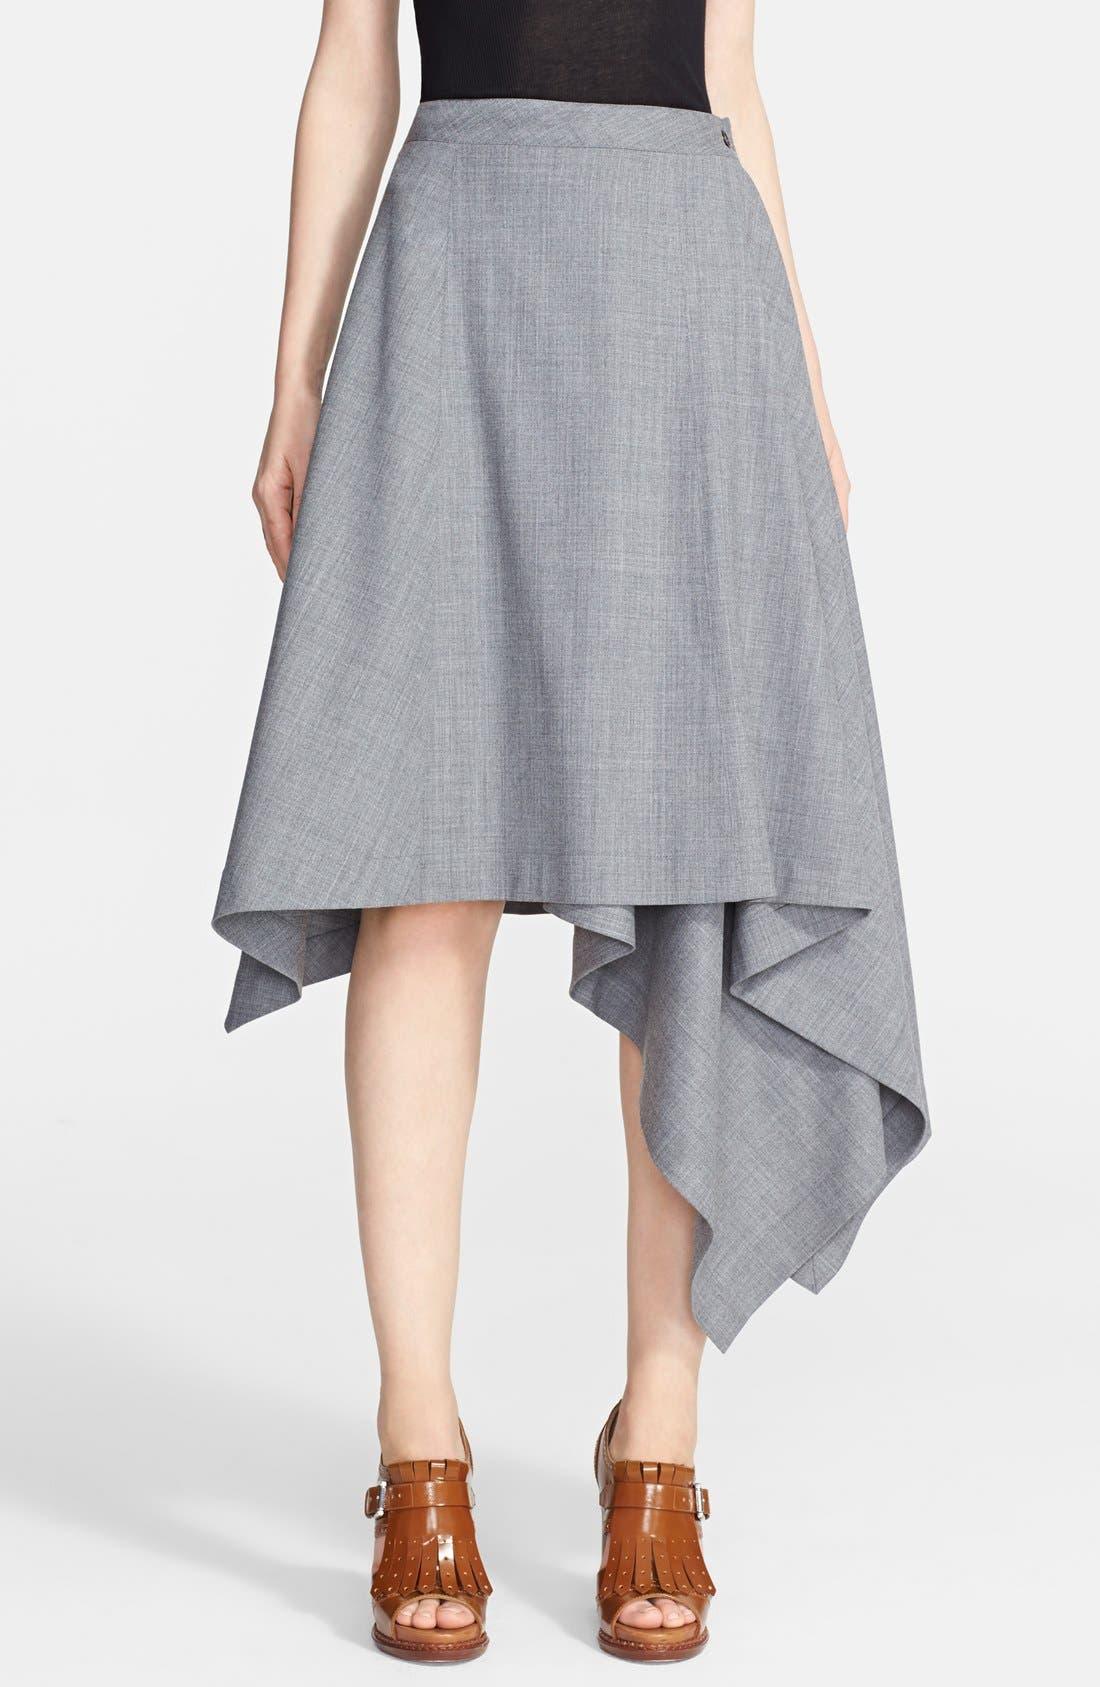 Alternate Image 1 Selected - Michael Kors Asymmetrical Hem Tropical Wool Skirt